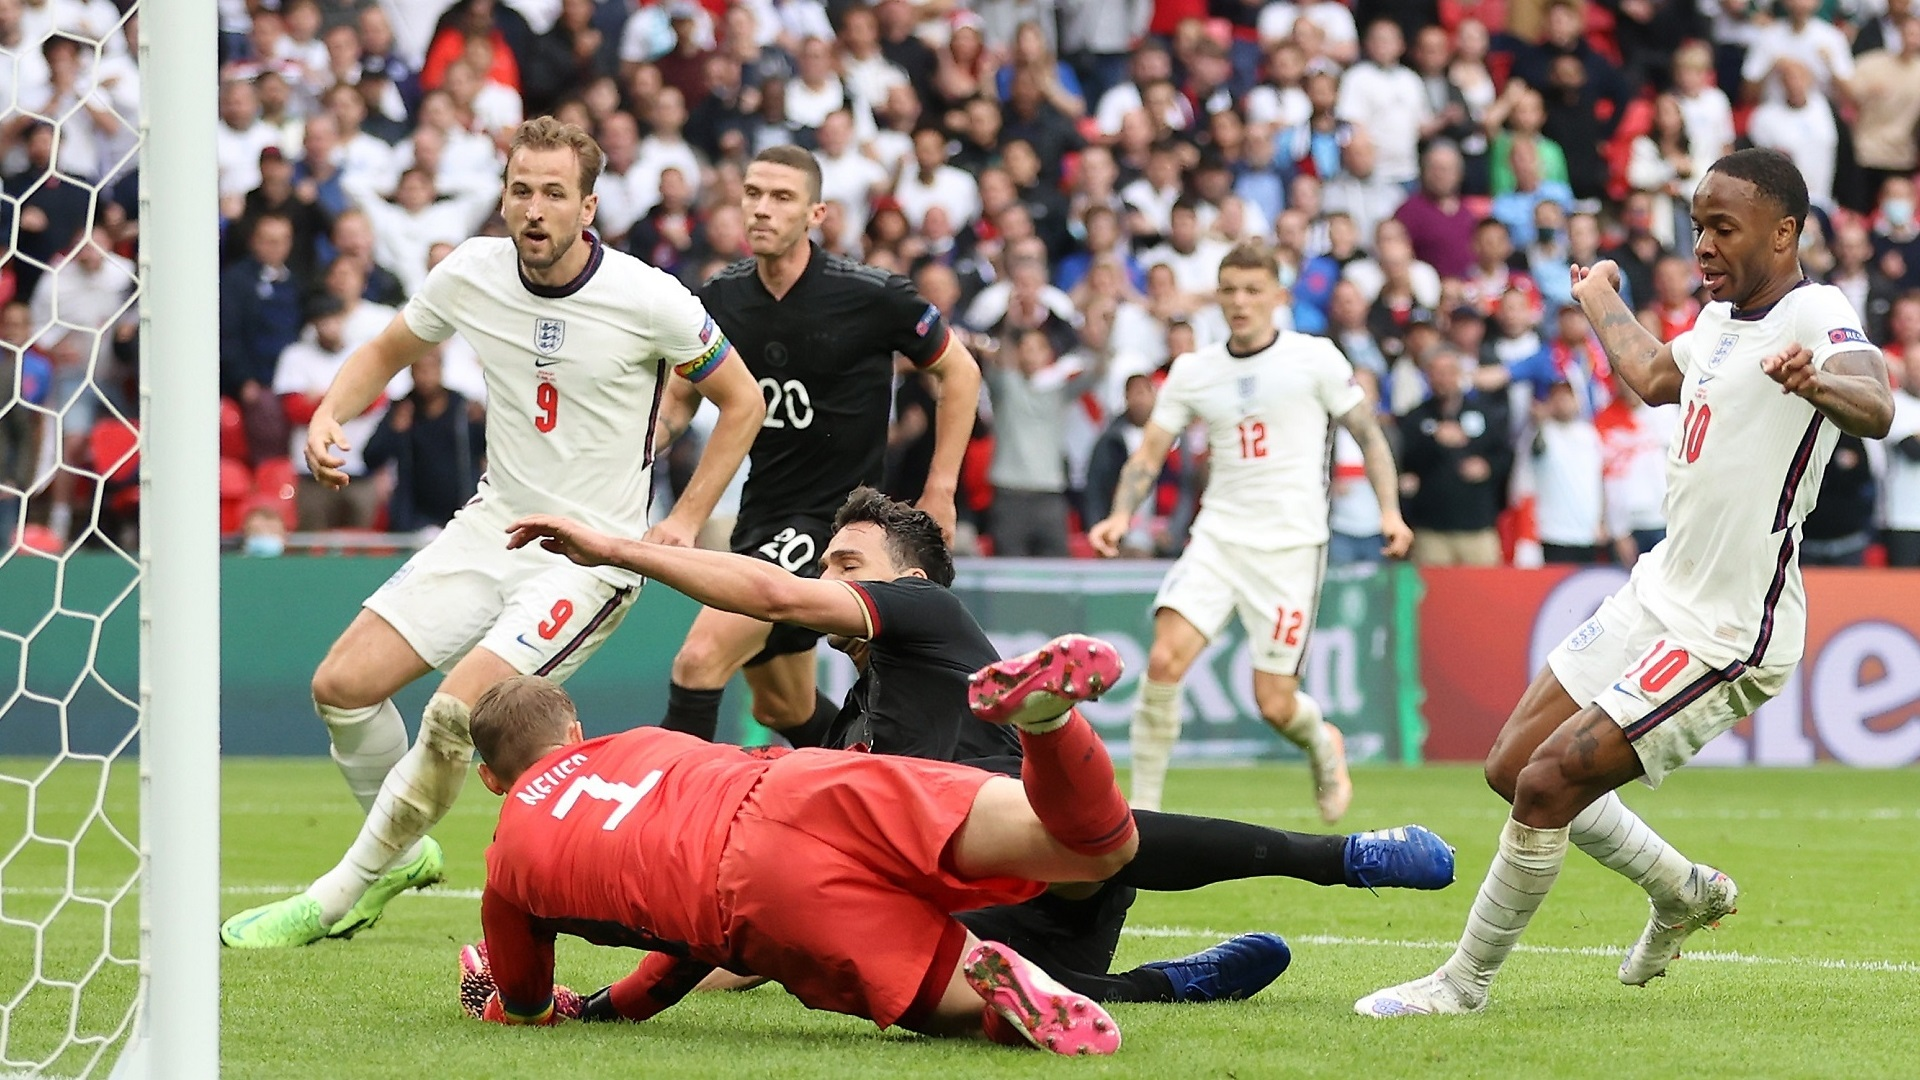 Euro 2020, Inghilterra-Germania 2-0: le foto - Euro 2020, Inghilterra- Germania 2-0: le foto